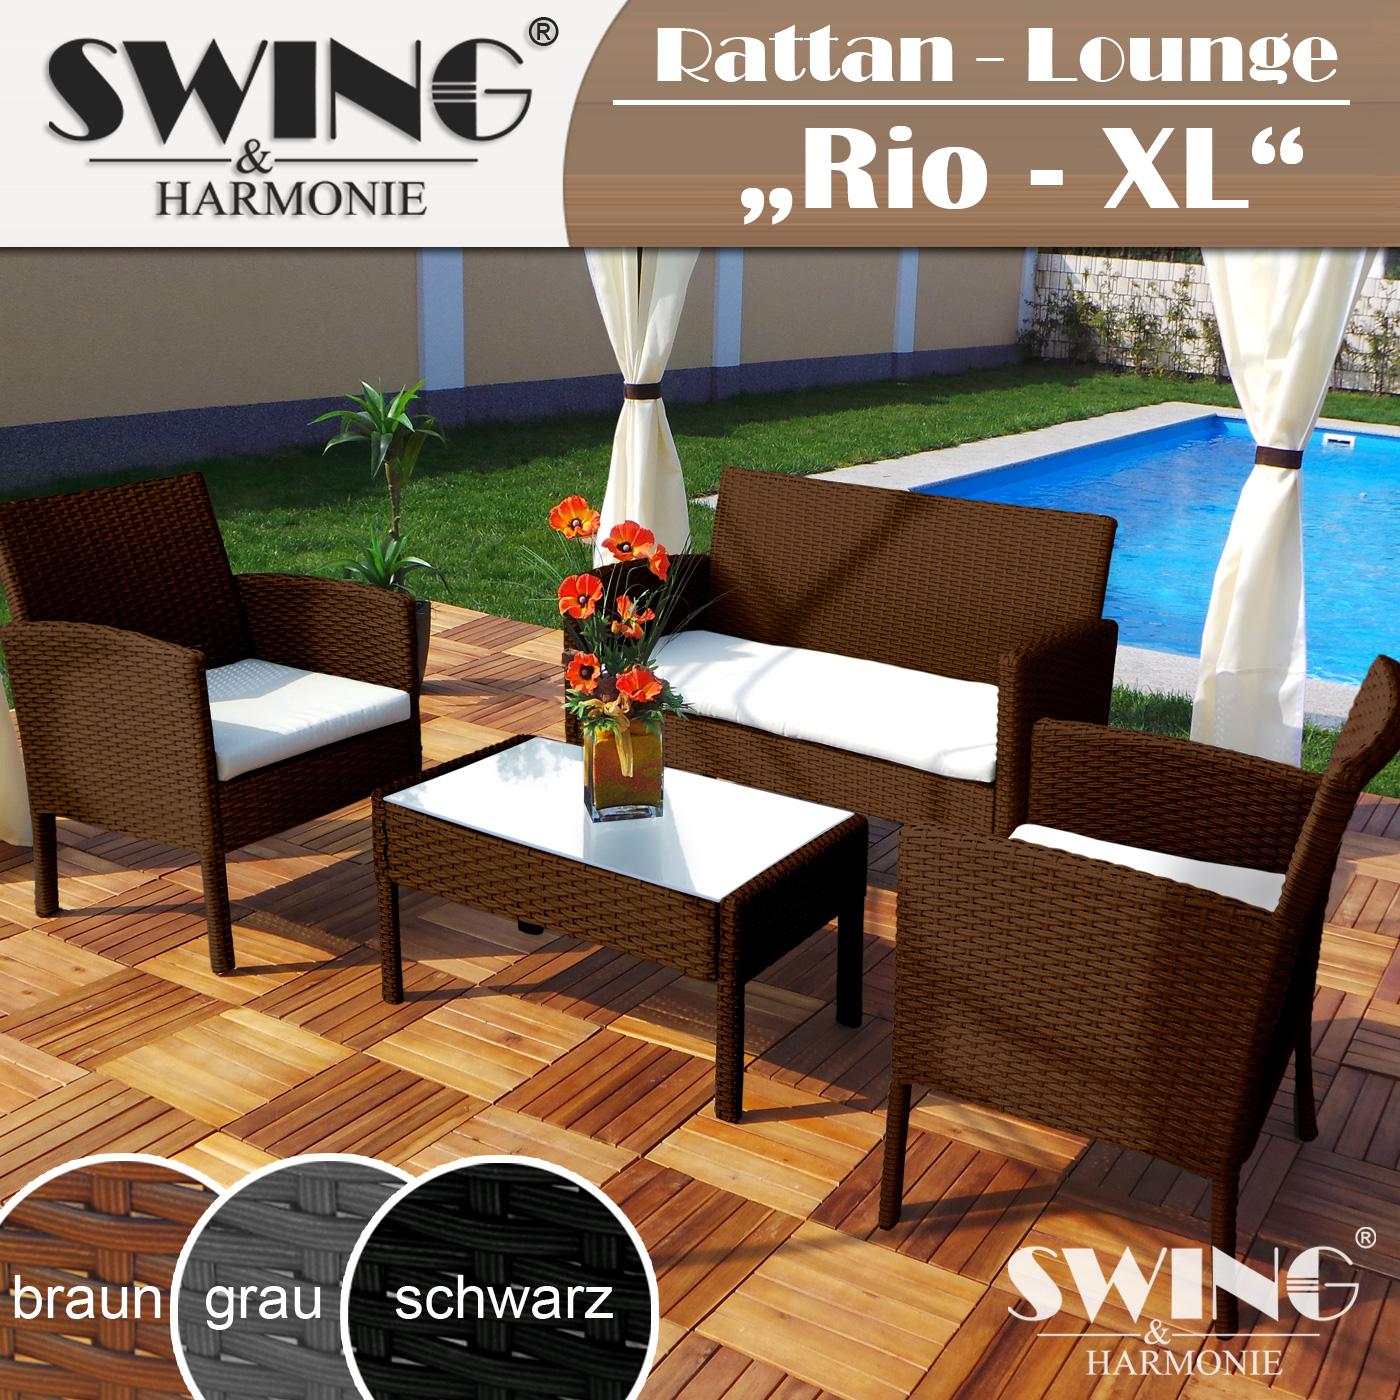 polyrattan sitzgruppe rattan lounge sitzgarnitur tisch. Black Bedroom Furniture Sets. Home Design Ideas